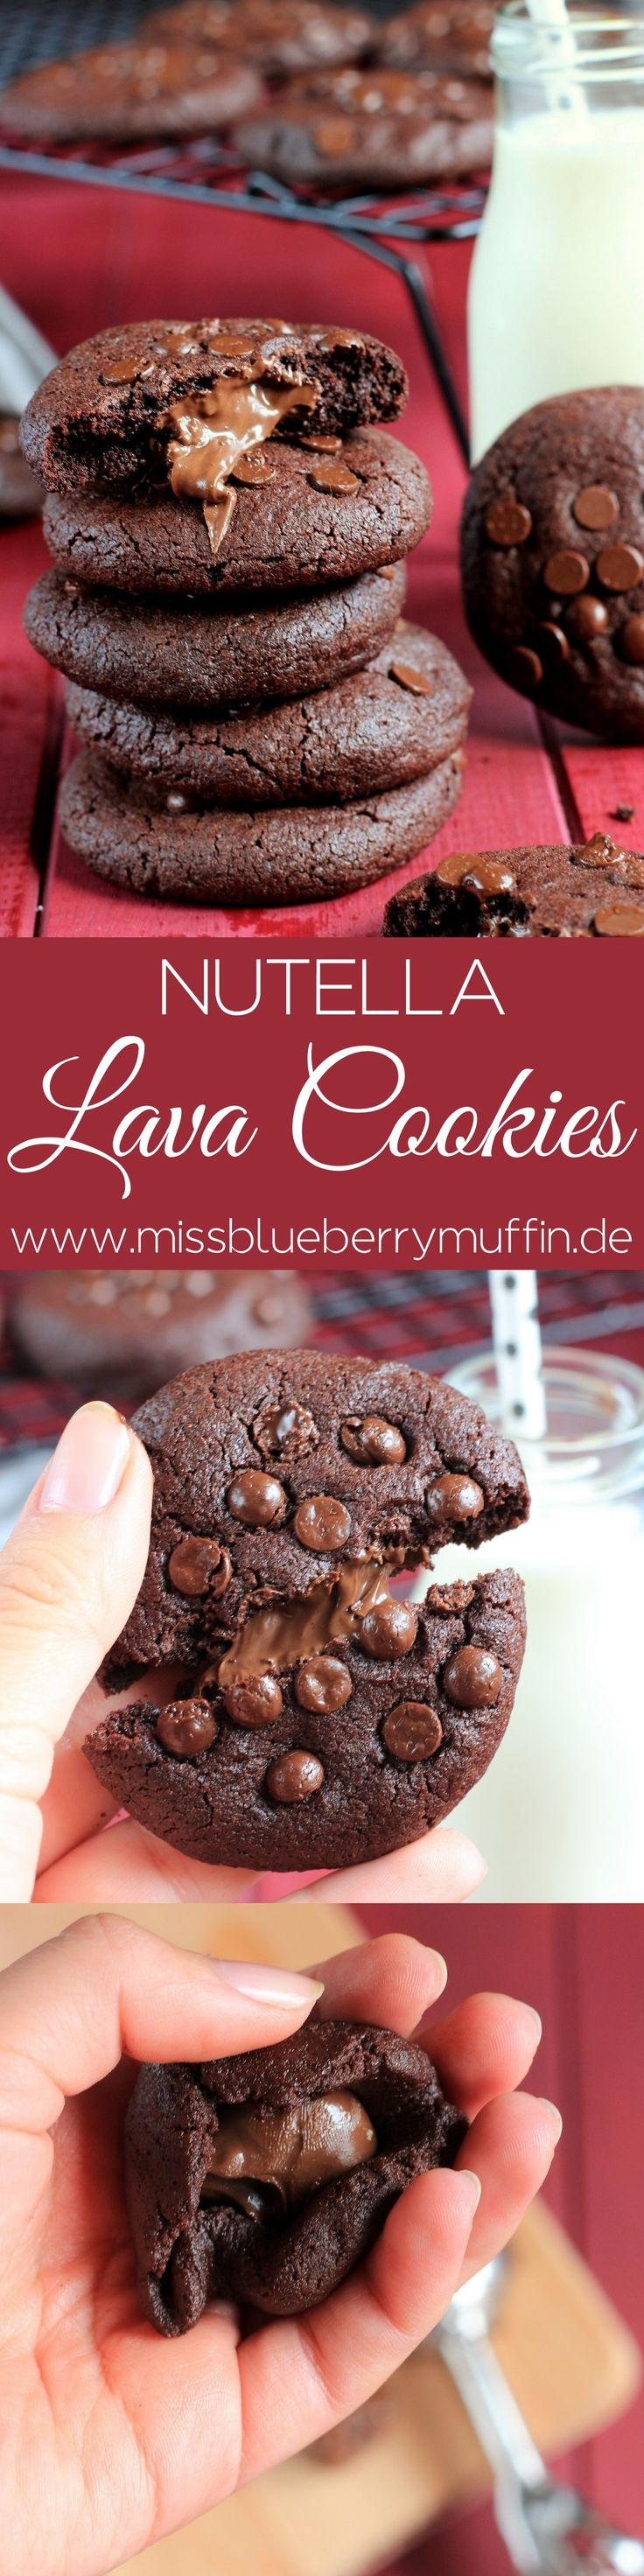 Rezept für besten gefüllten nutellla Lava Cookies best nuetalla lava cookies 3